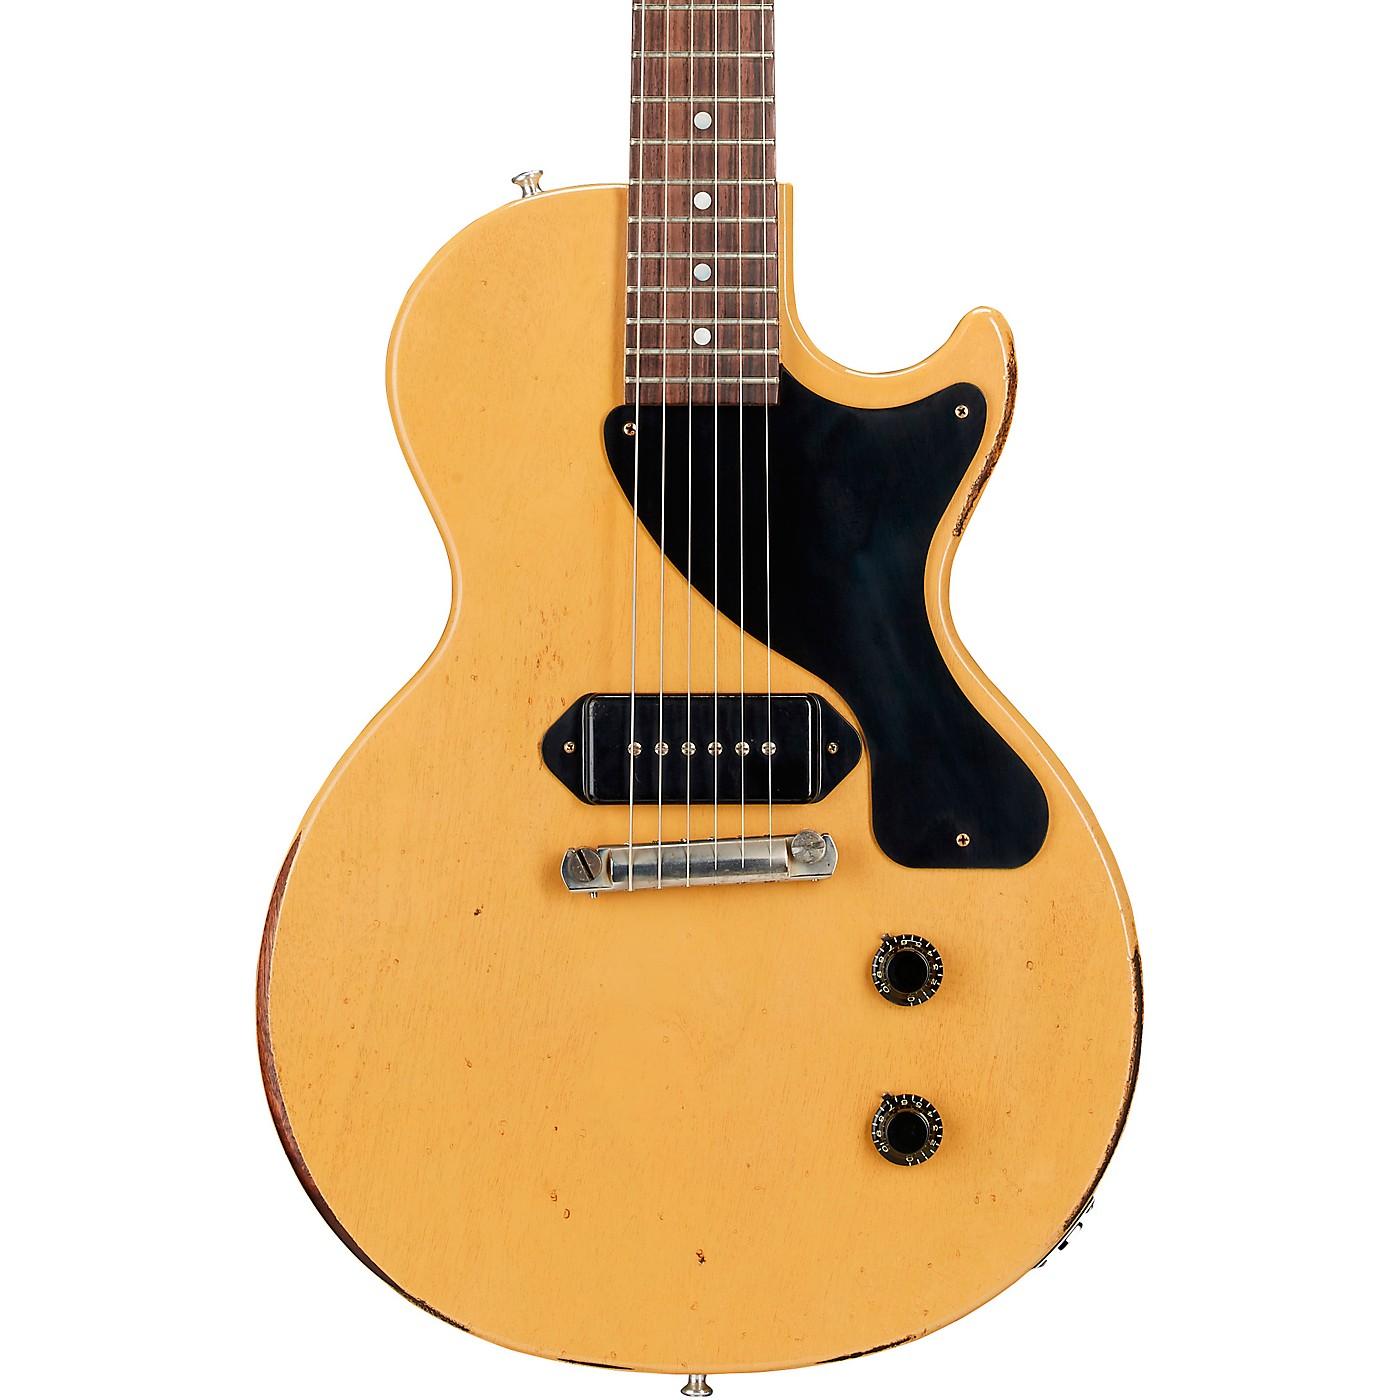 Gibson Custom Murphy Lab 1957 Les Paul Junior Single Cut Reissue Heavy Aged Electric Guitar thumbnail